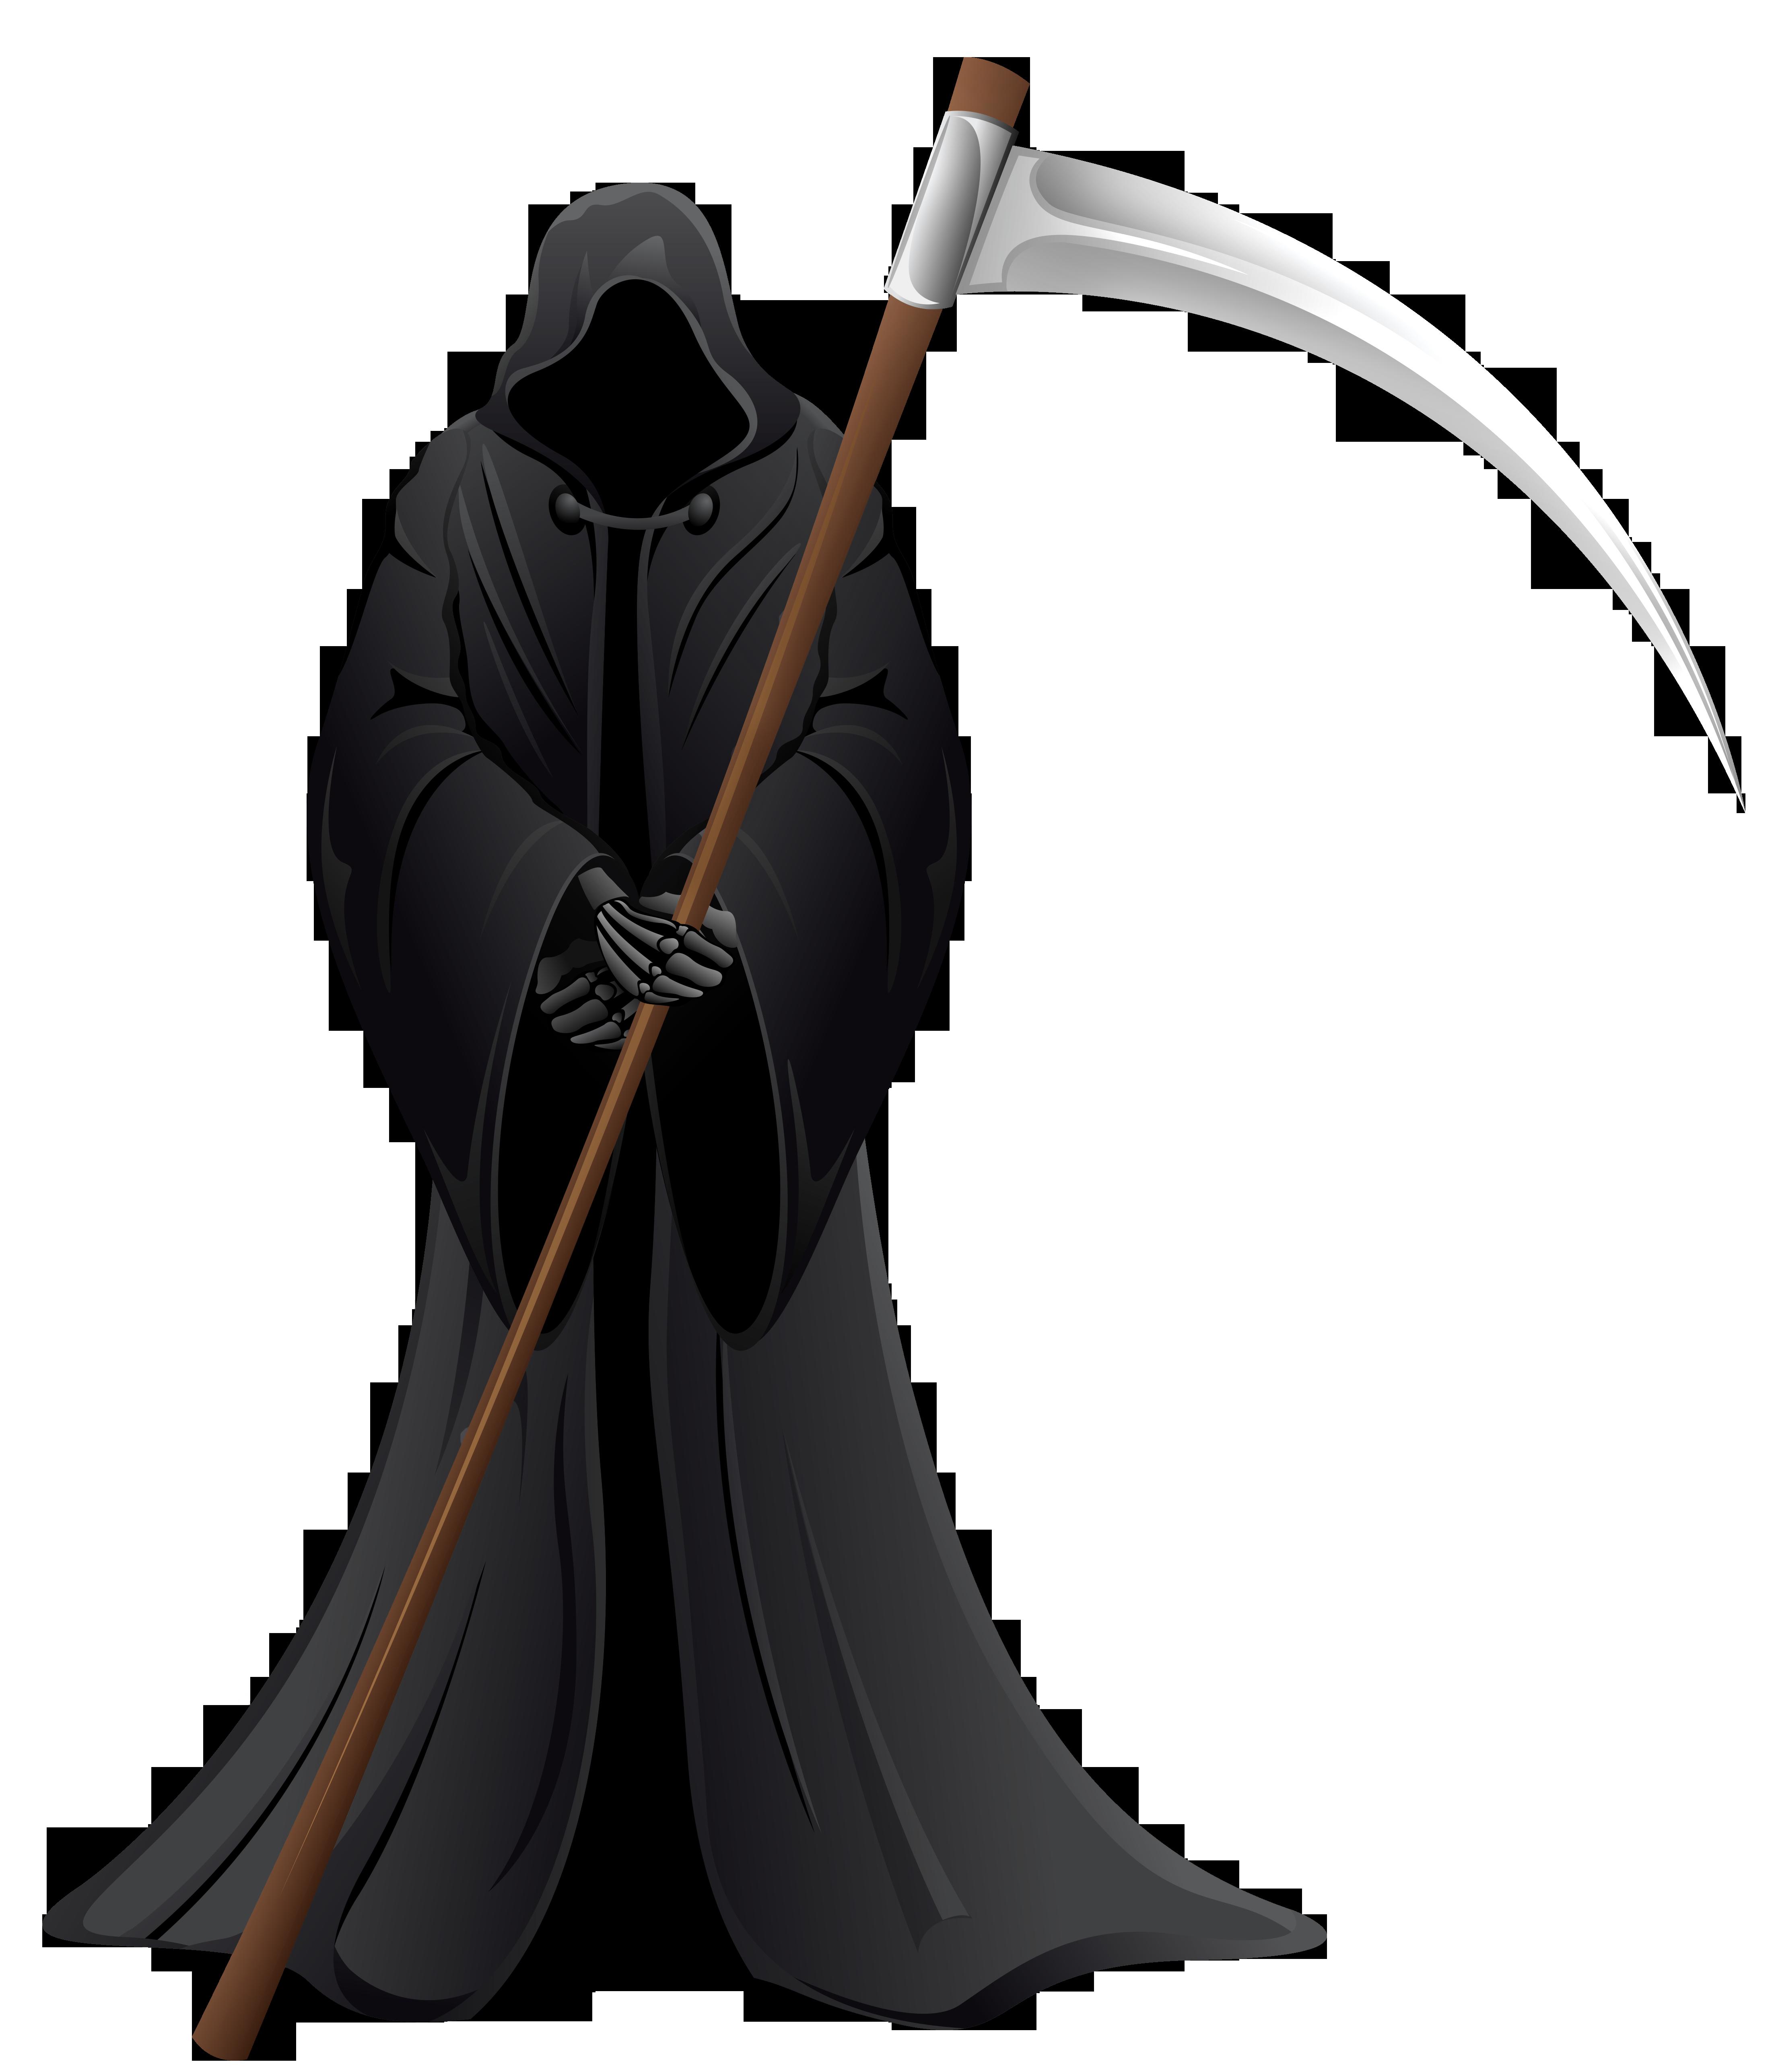 clipart library Grim reaper clipart demise. Transparent background frames illustrations